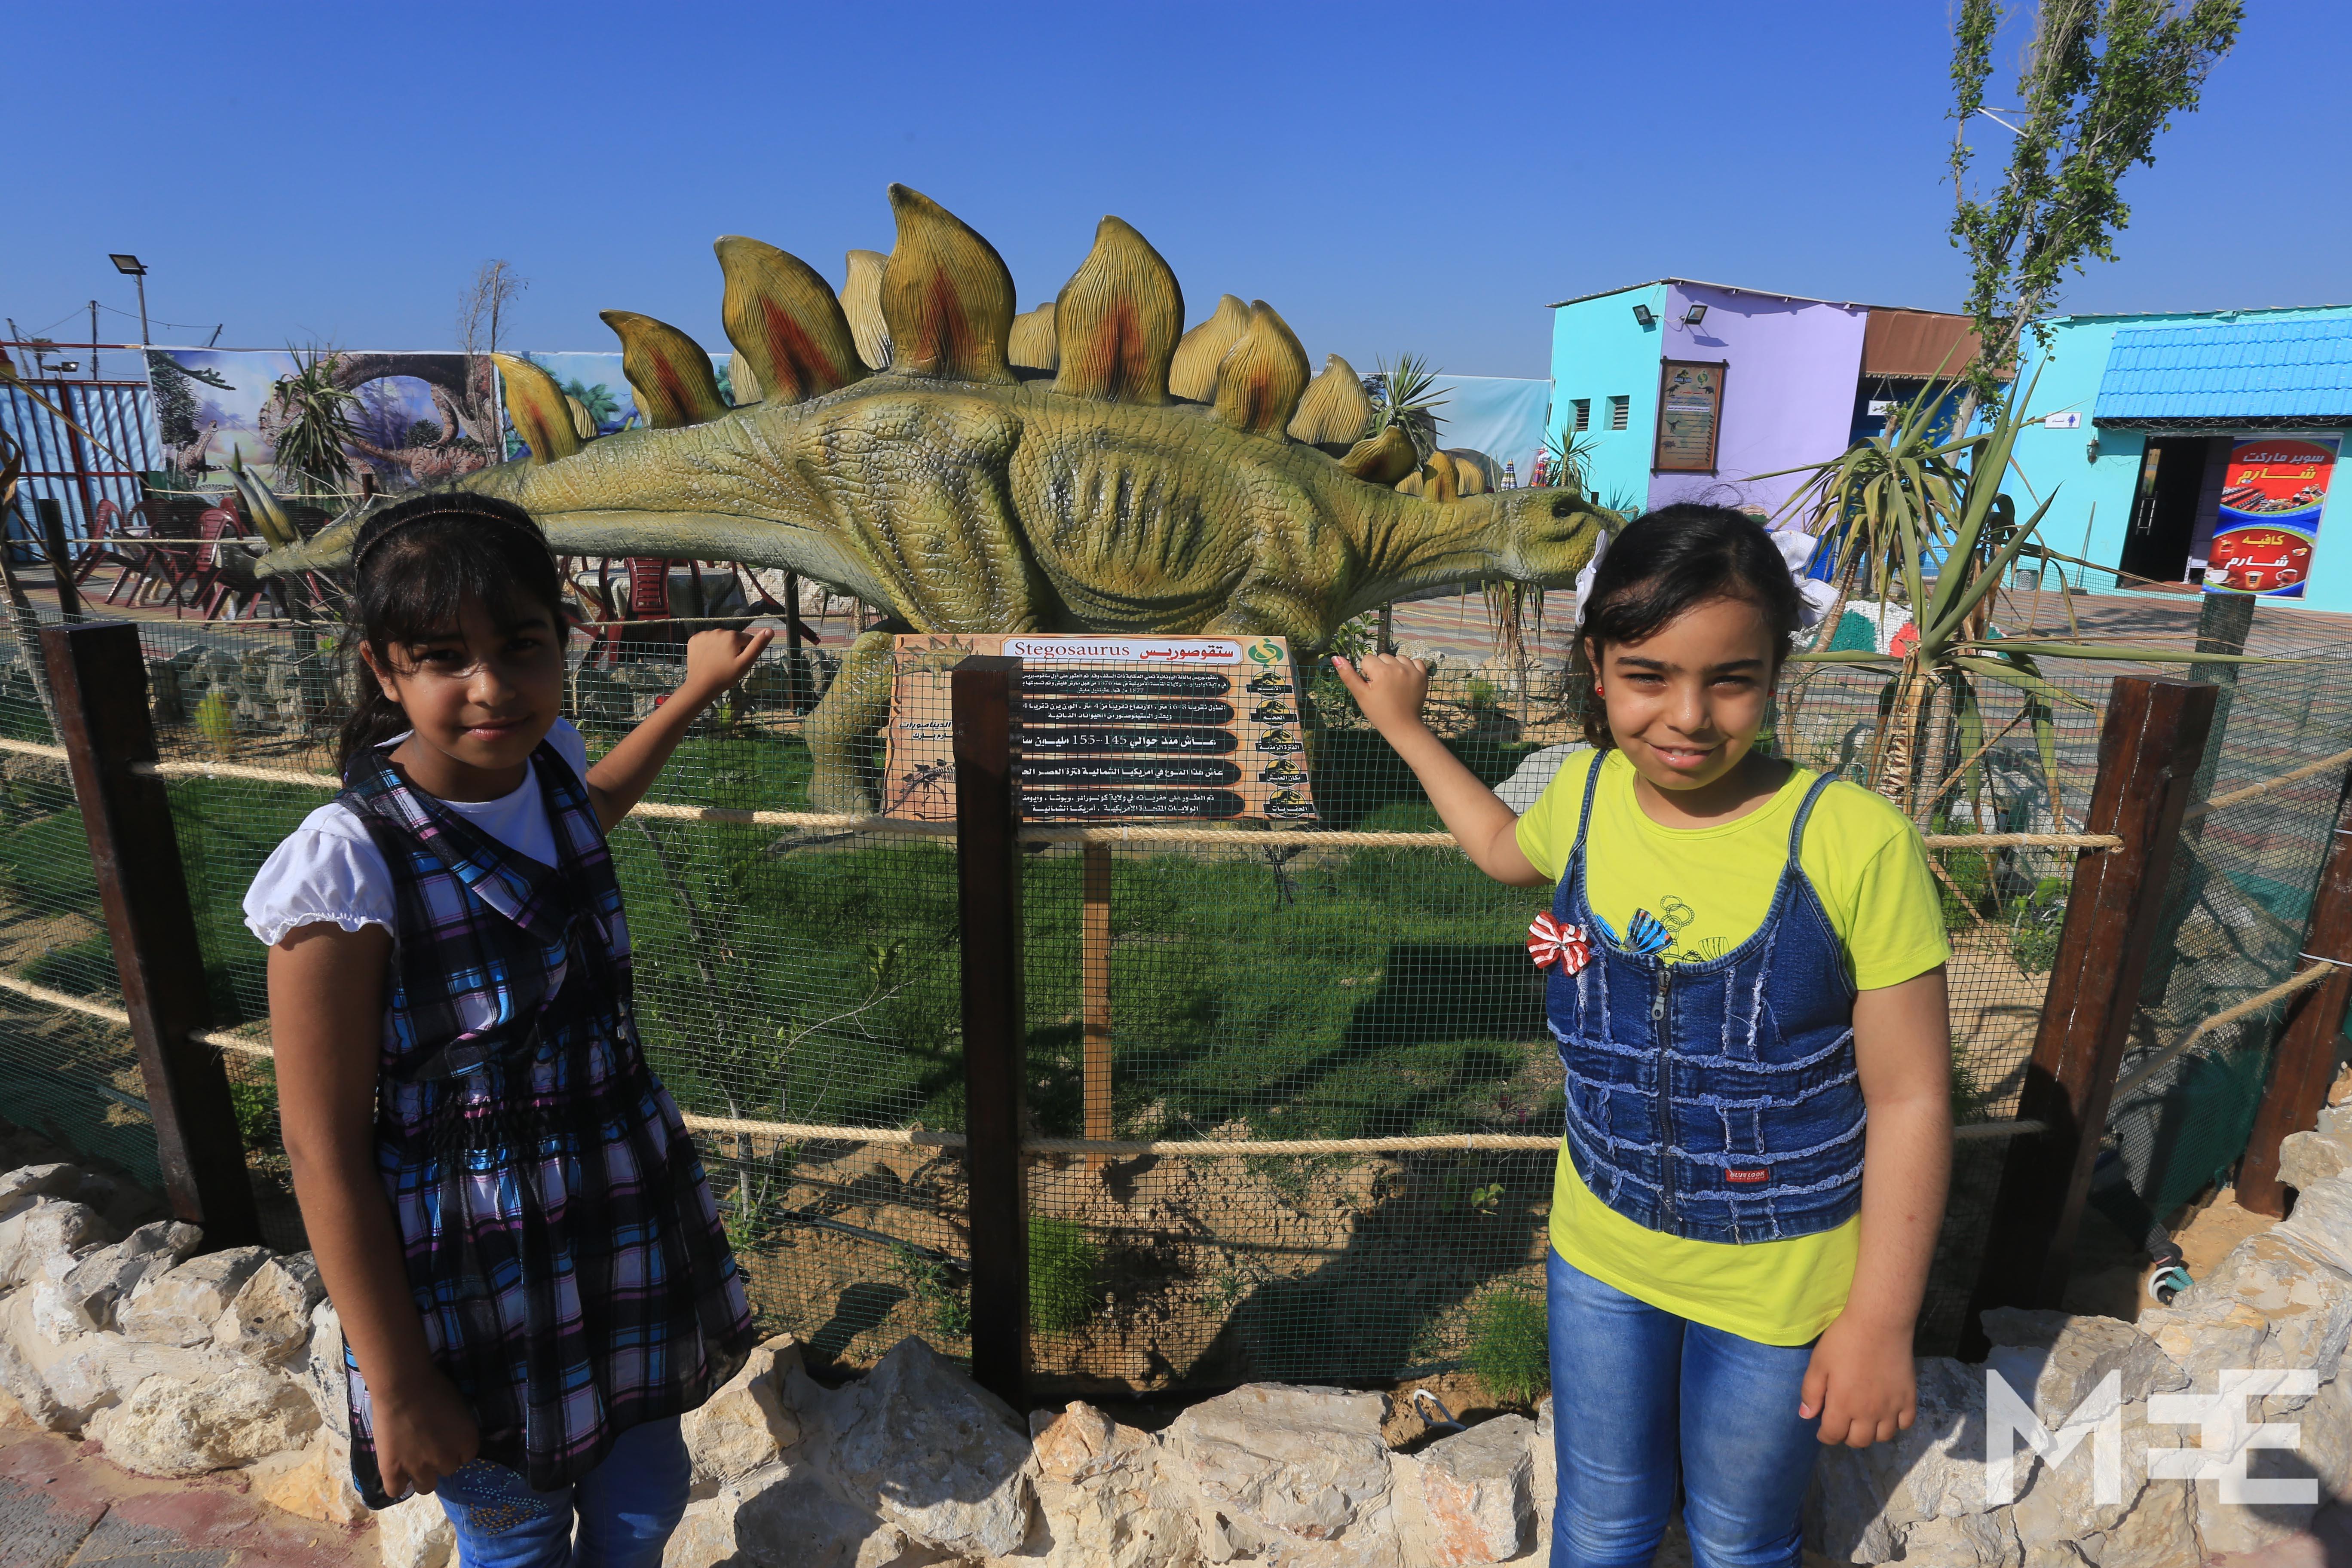 Dinosaur Park Gift Shop Visitors Center